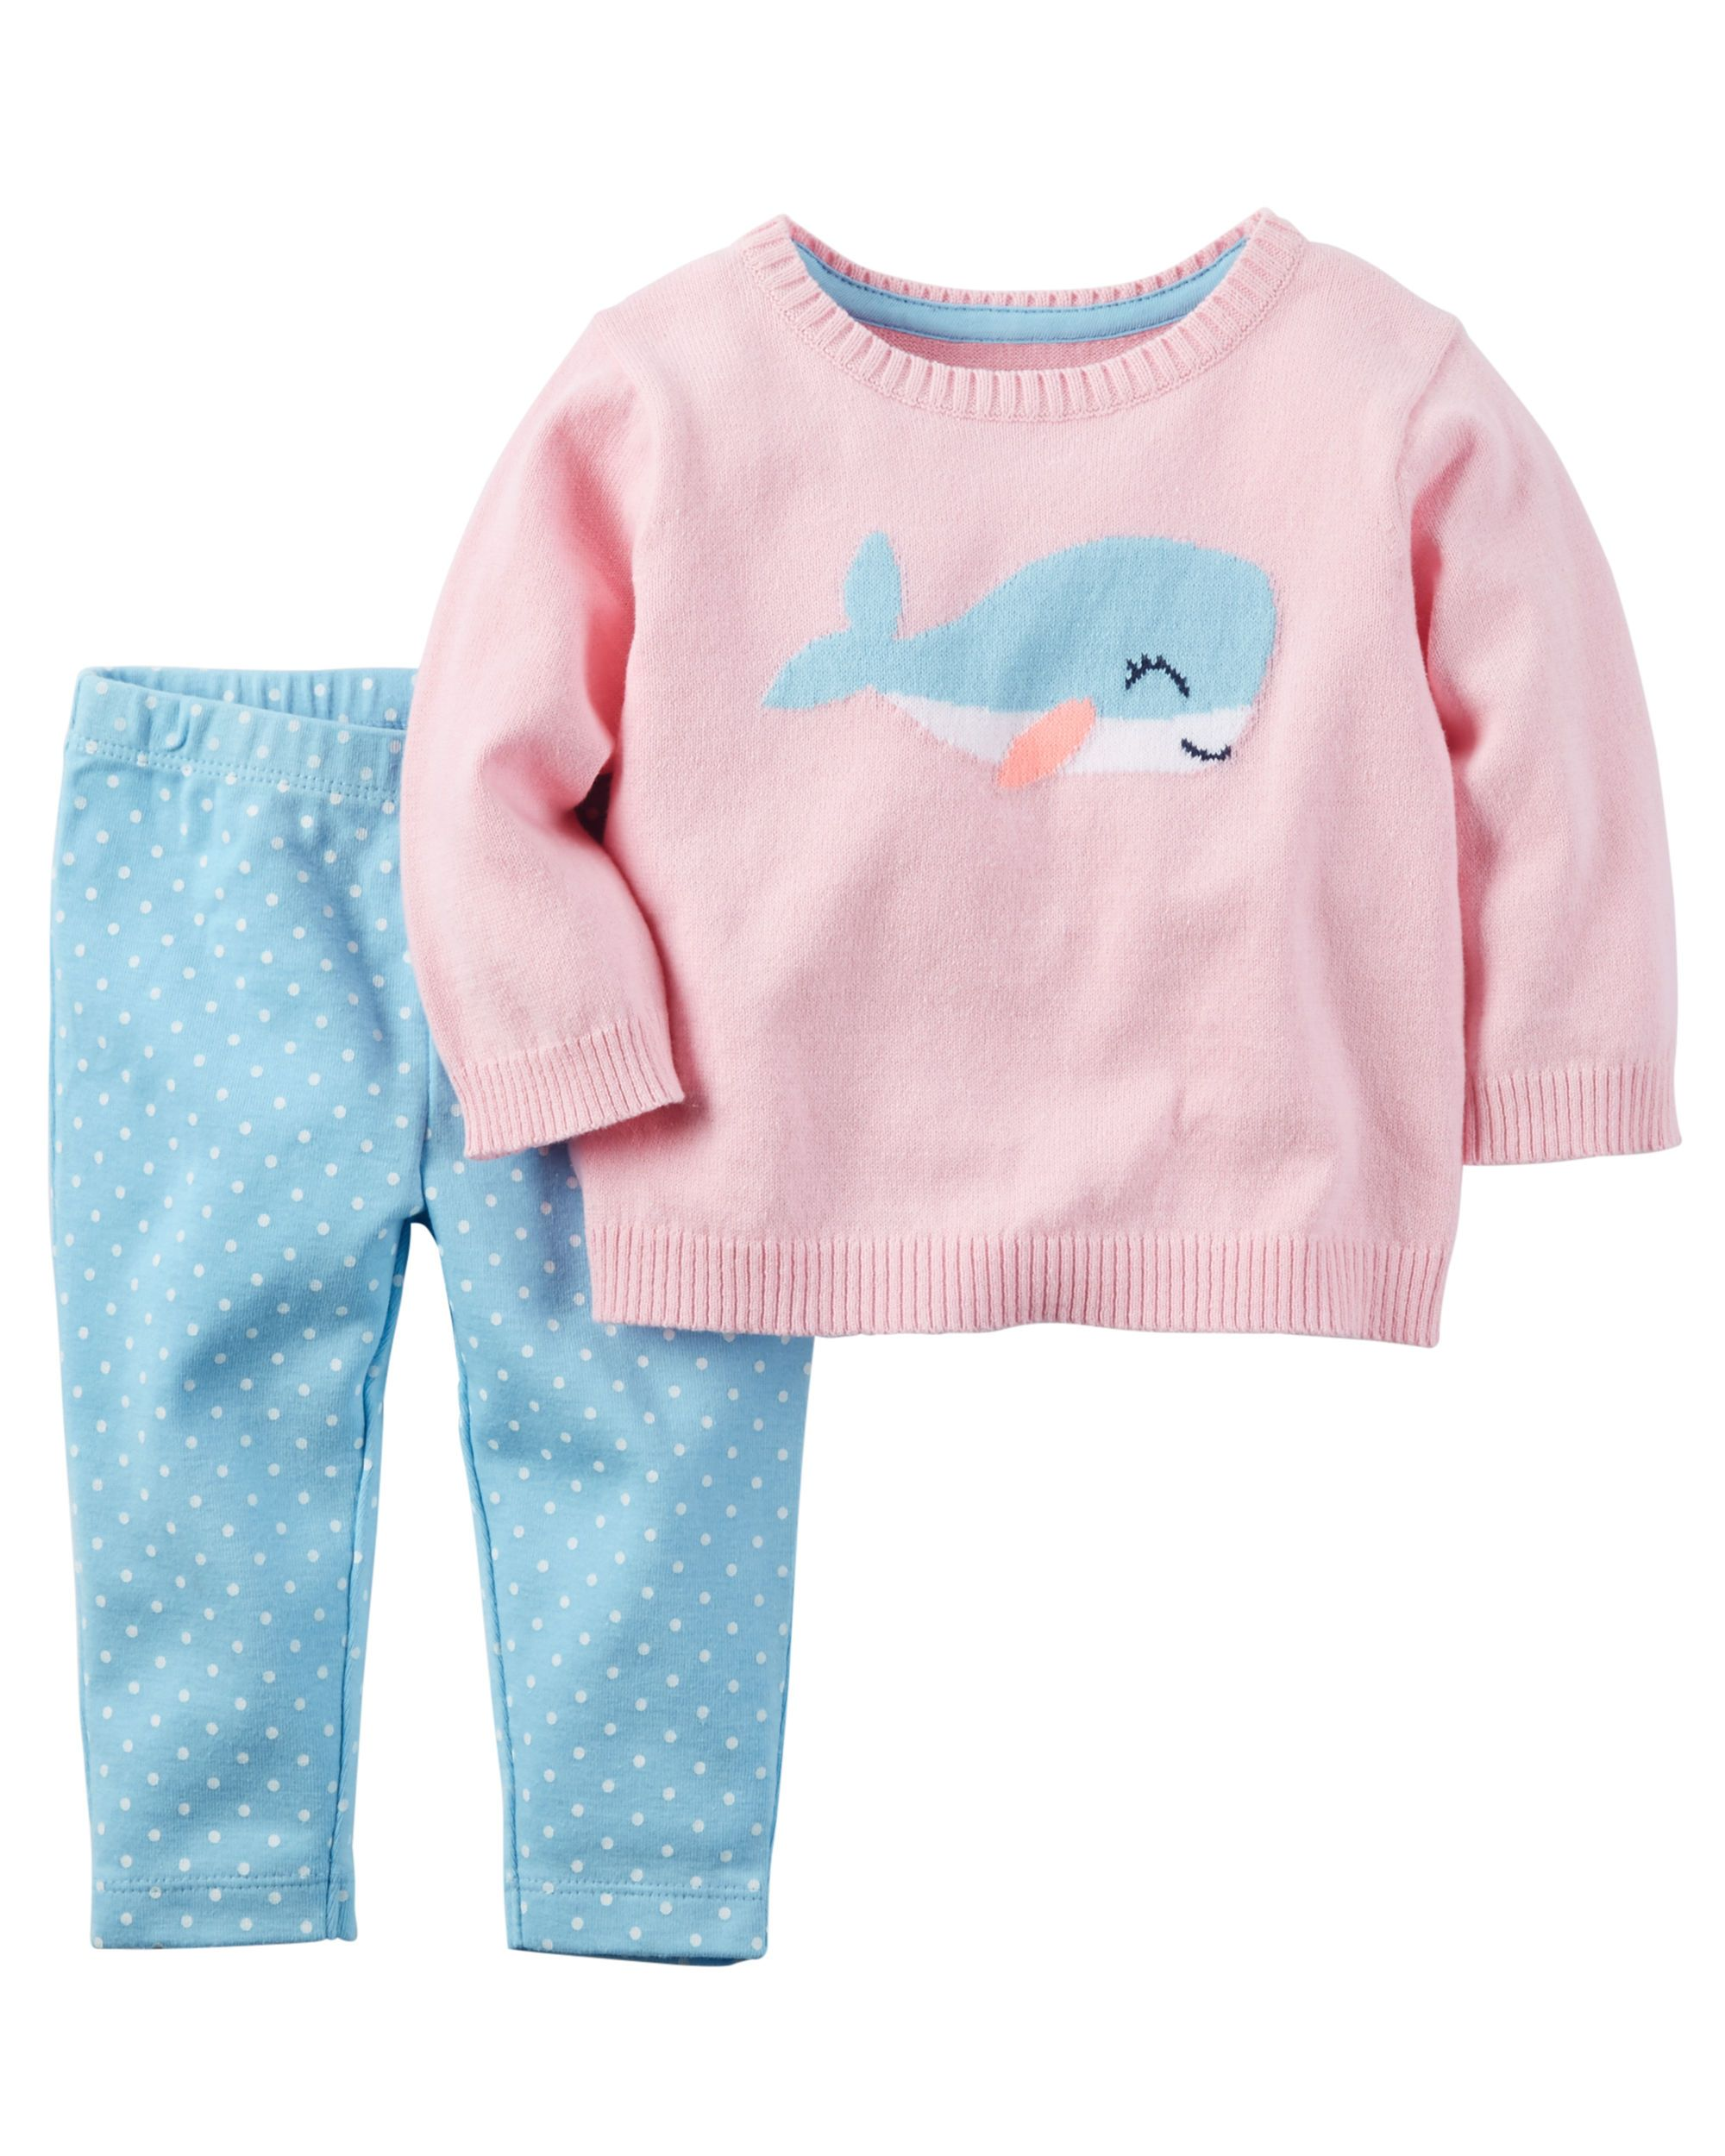 2 Piece Little Sweater Set